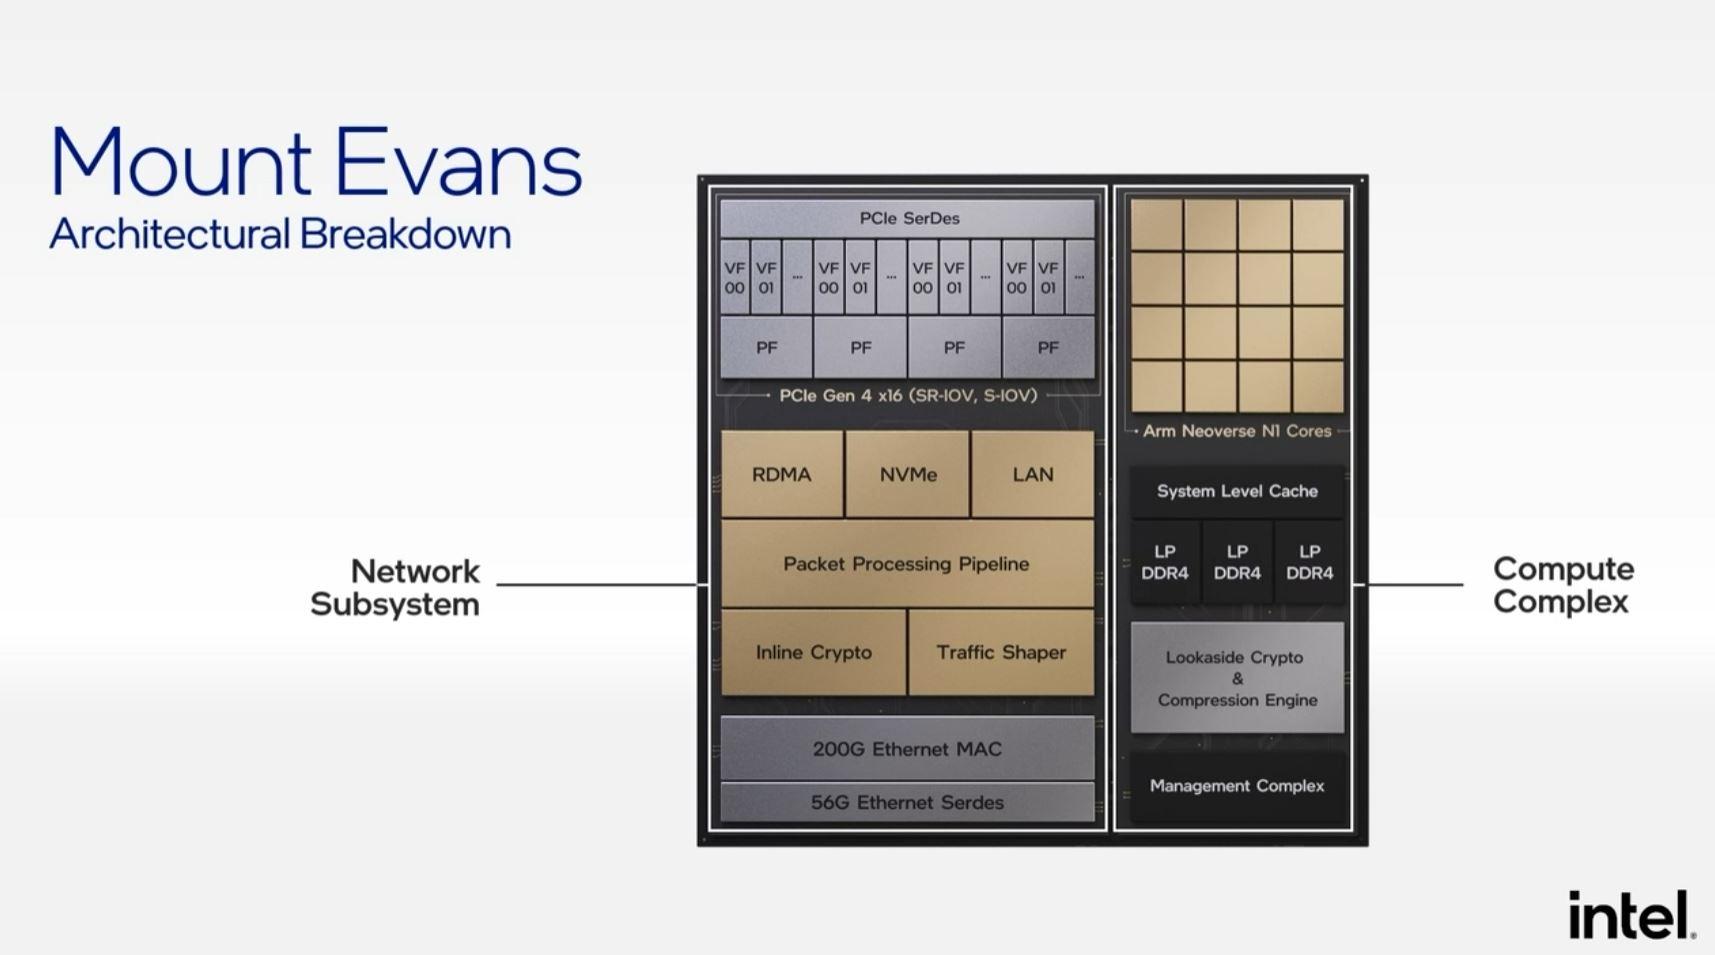 Intel Architecture Day 2021 IPU Mount Evans ASIC Block Diagram